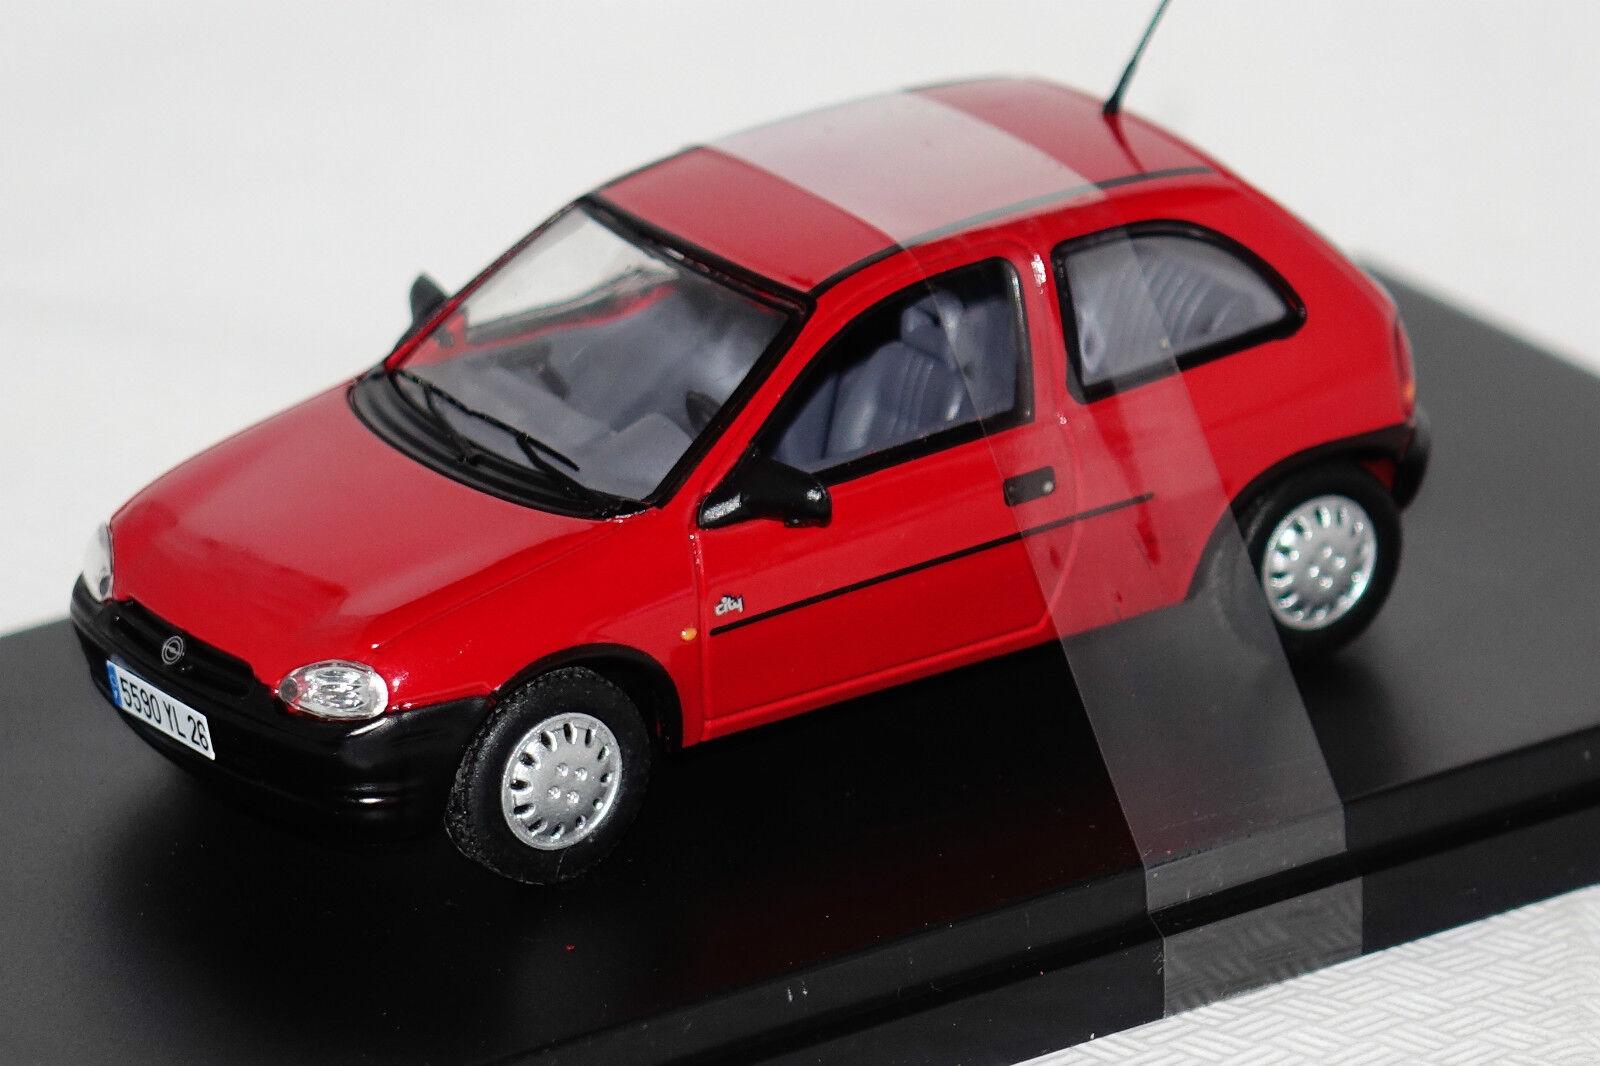 Opel Corsa B 1994 red 1 43 PremiumX  neu & OVP PRD427